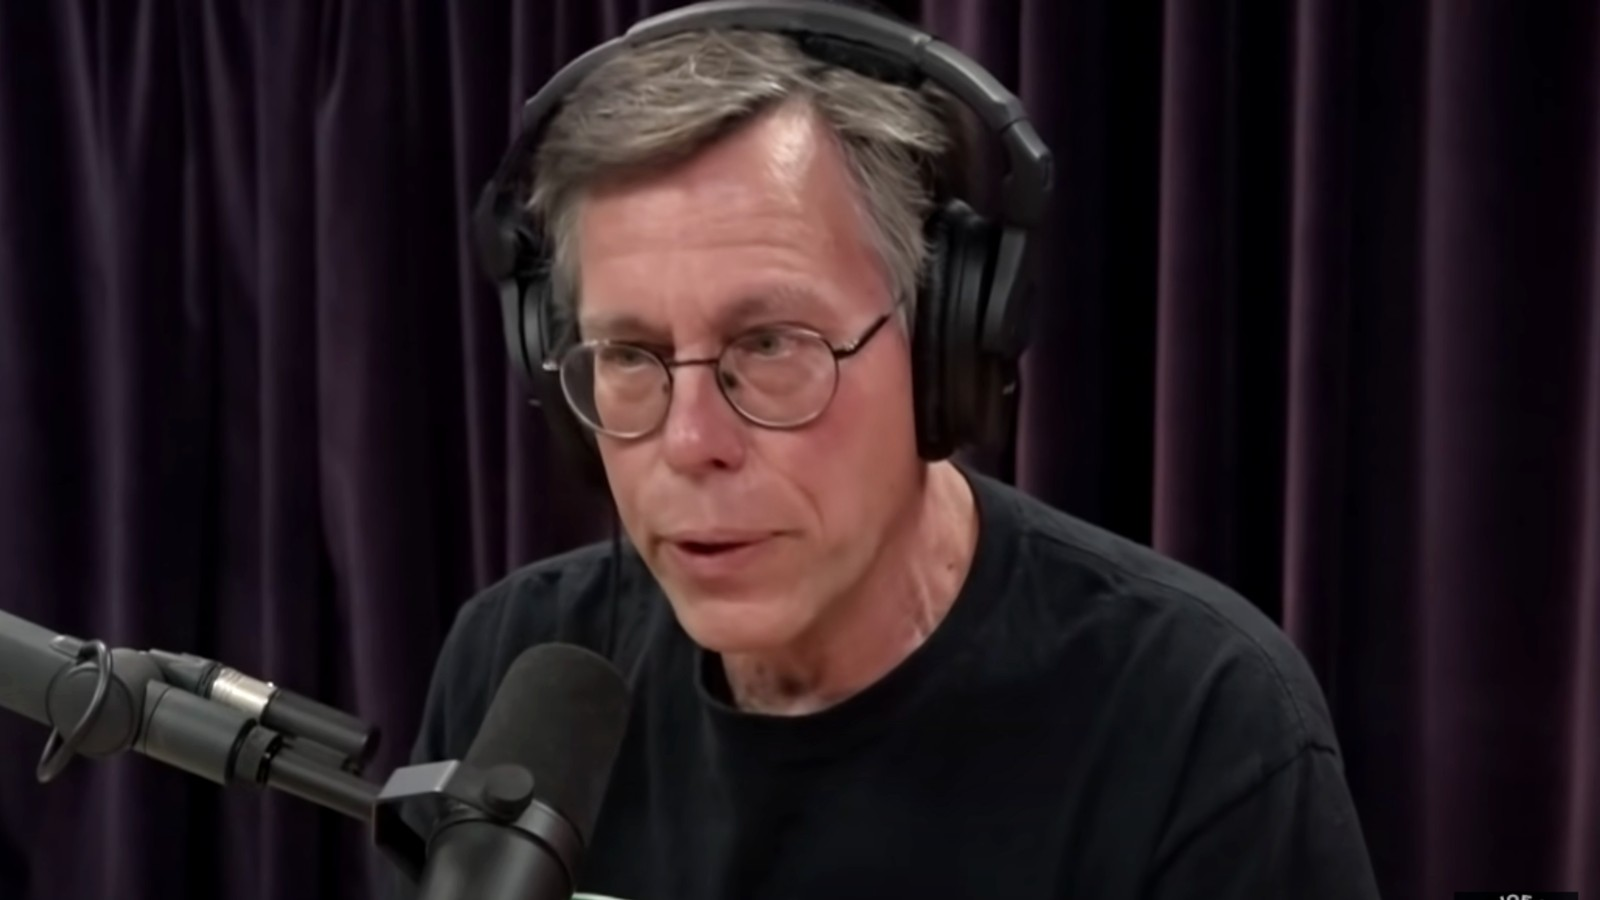 Bob Lazar on the Joe Rogan podcast